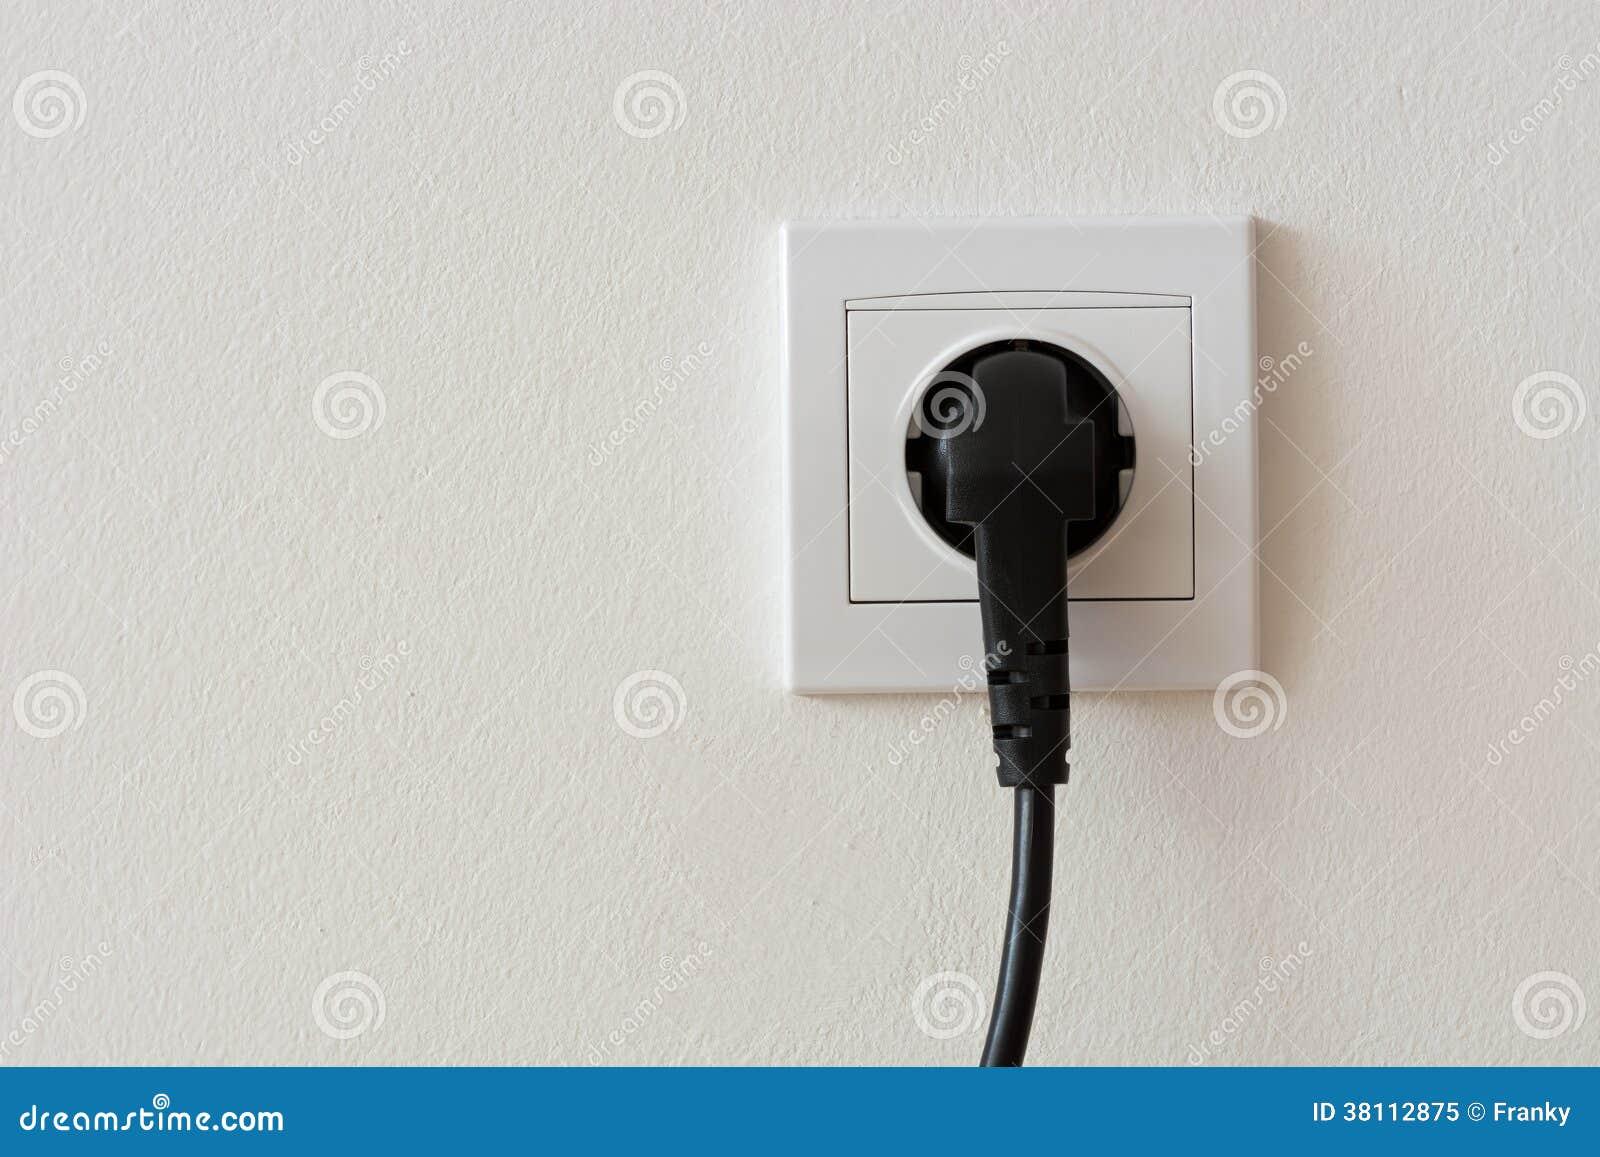 Brilliant Black 220 Volt Power Plug Plugged In A Socket Stock Image Image Of Wiring Cloud Venetbieswglorg